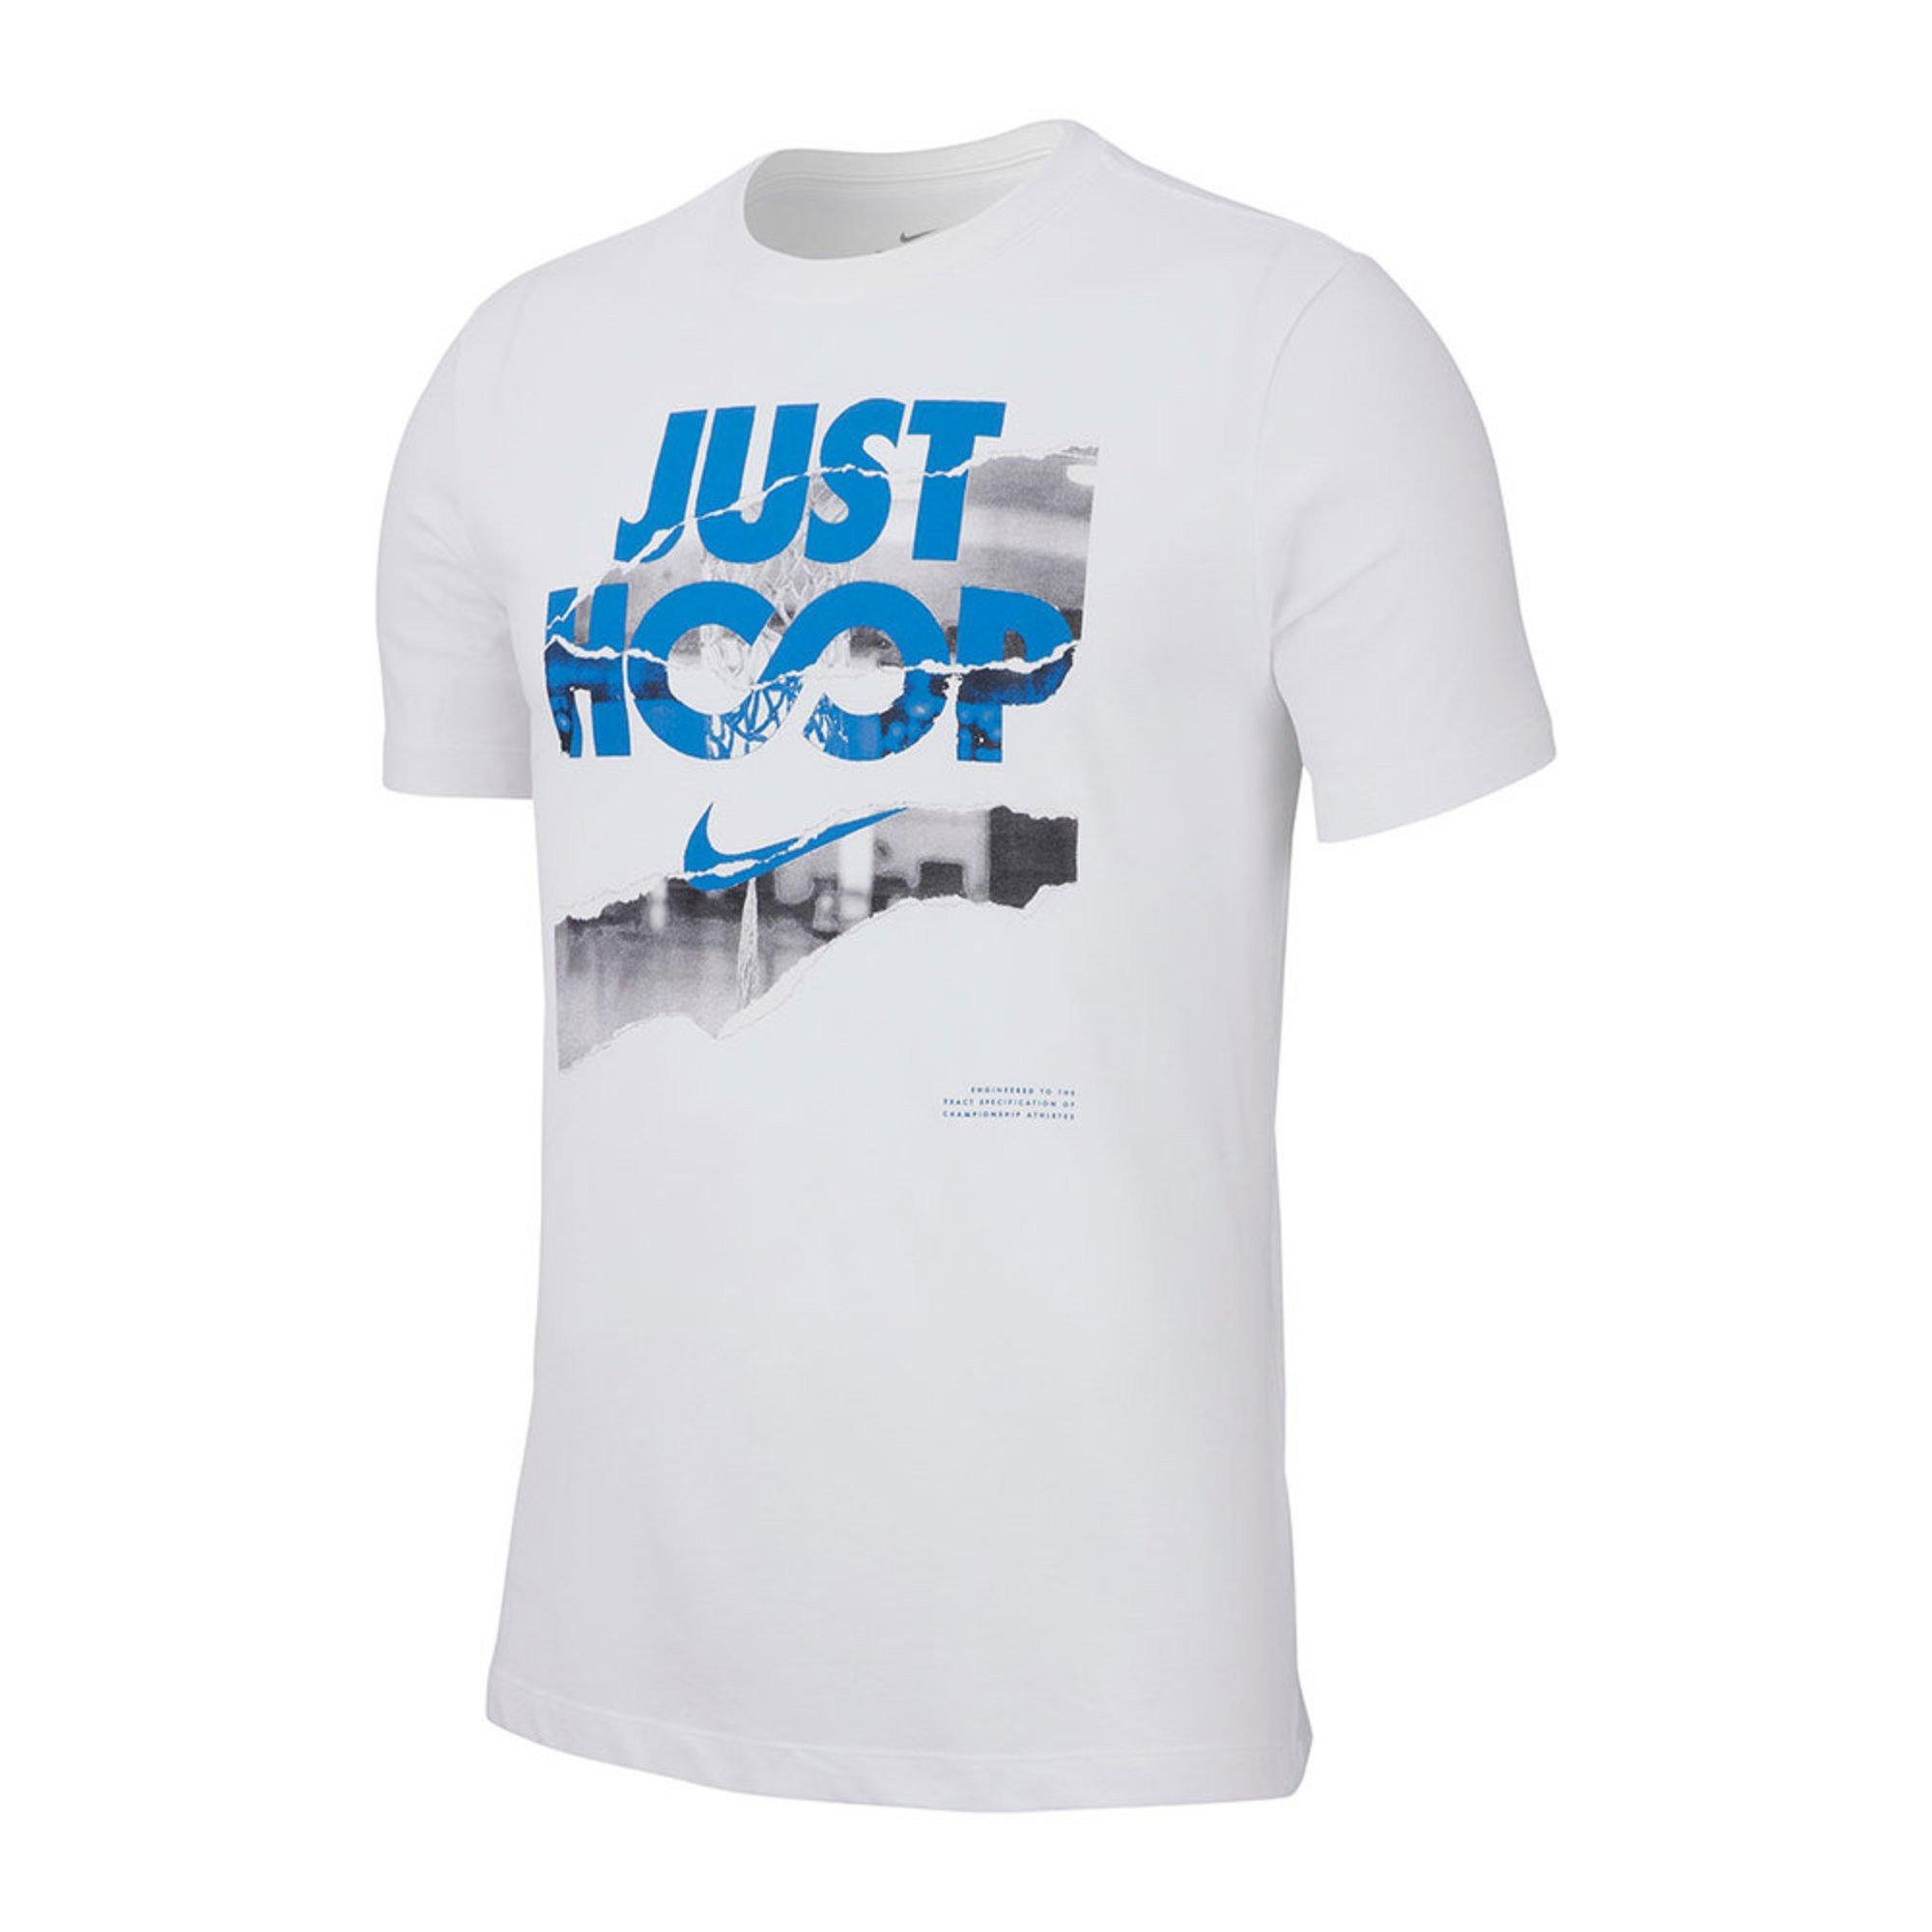 7da49ce8 Nike Men's Dri-fit Short Sleeve Just Hoops Tee | Active Tees ...